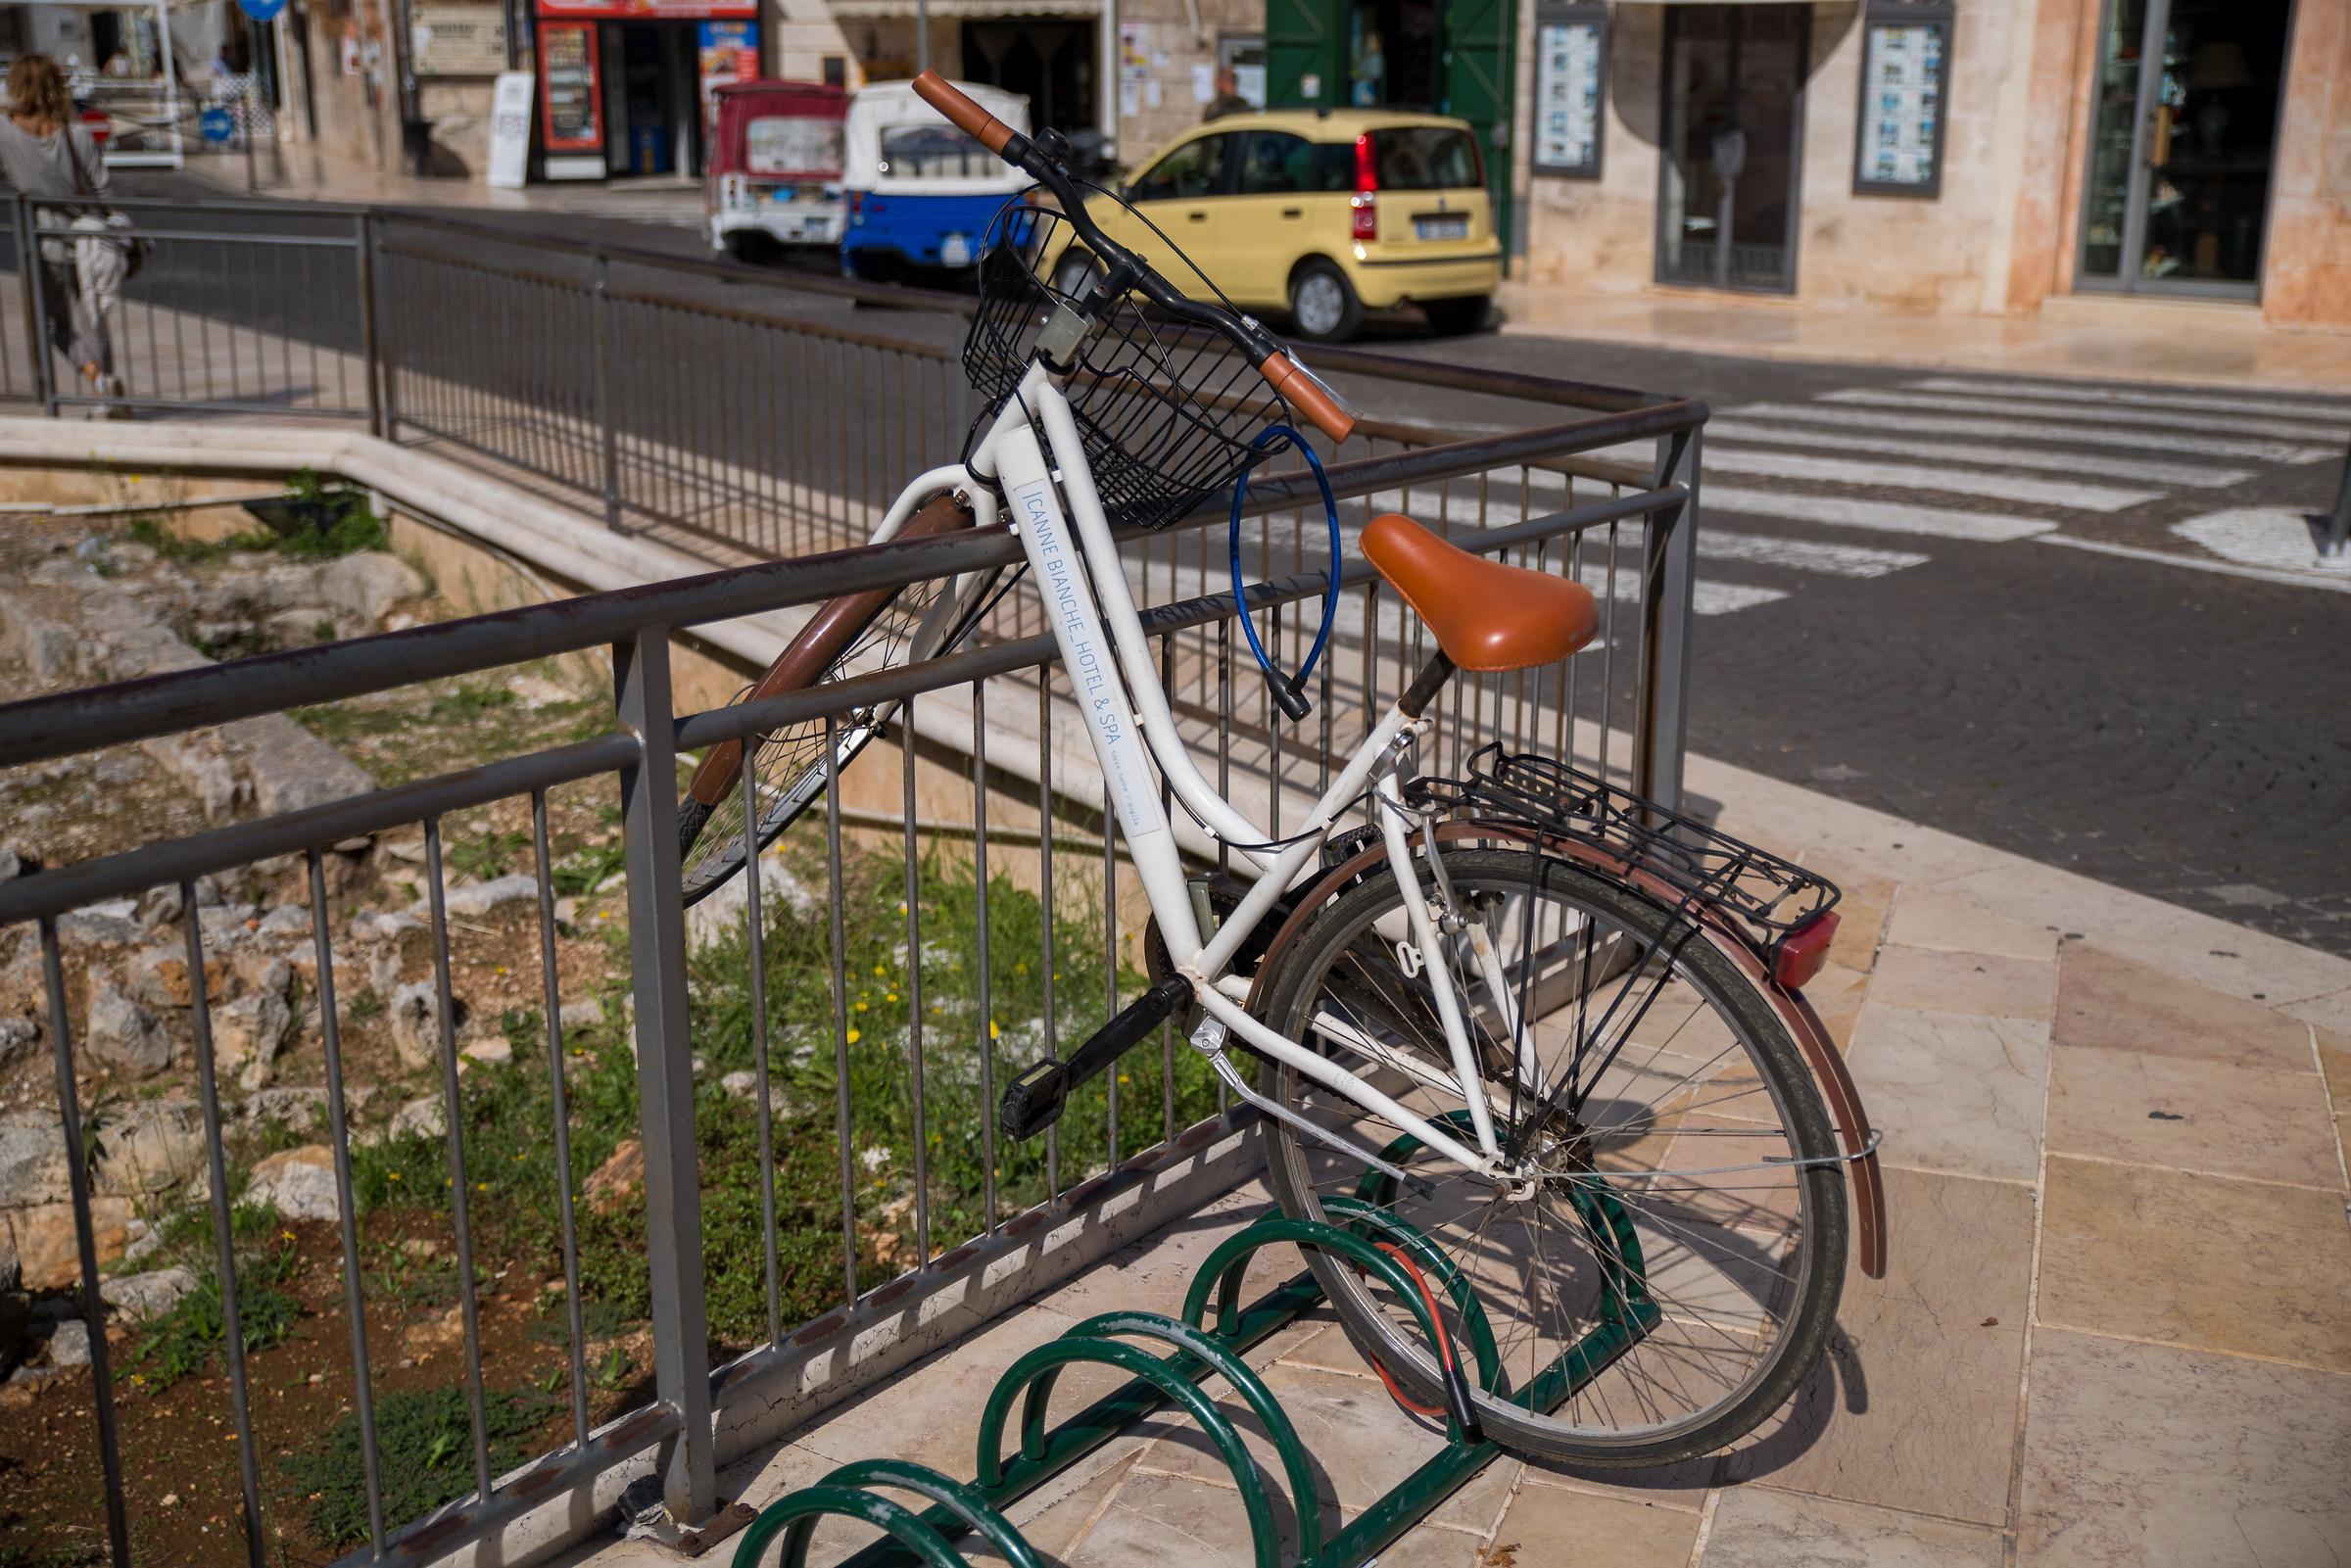 Bike with Wild Parking...